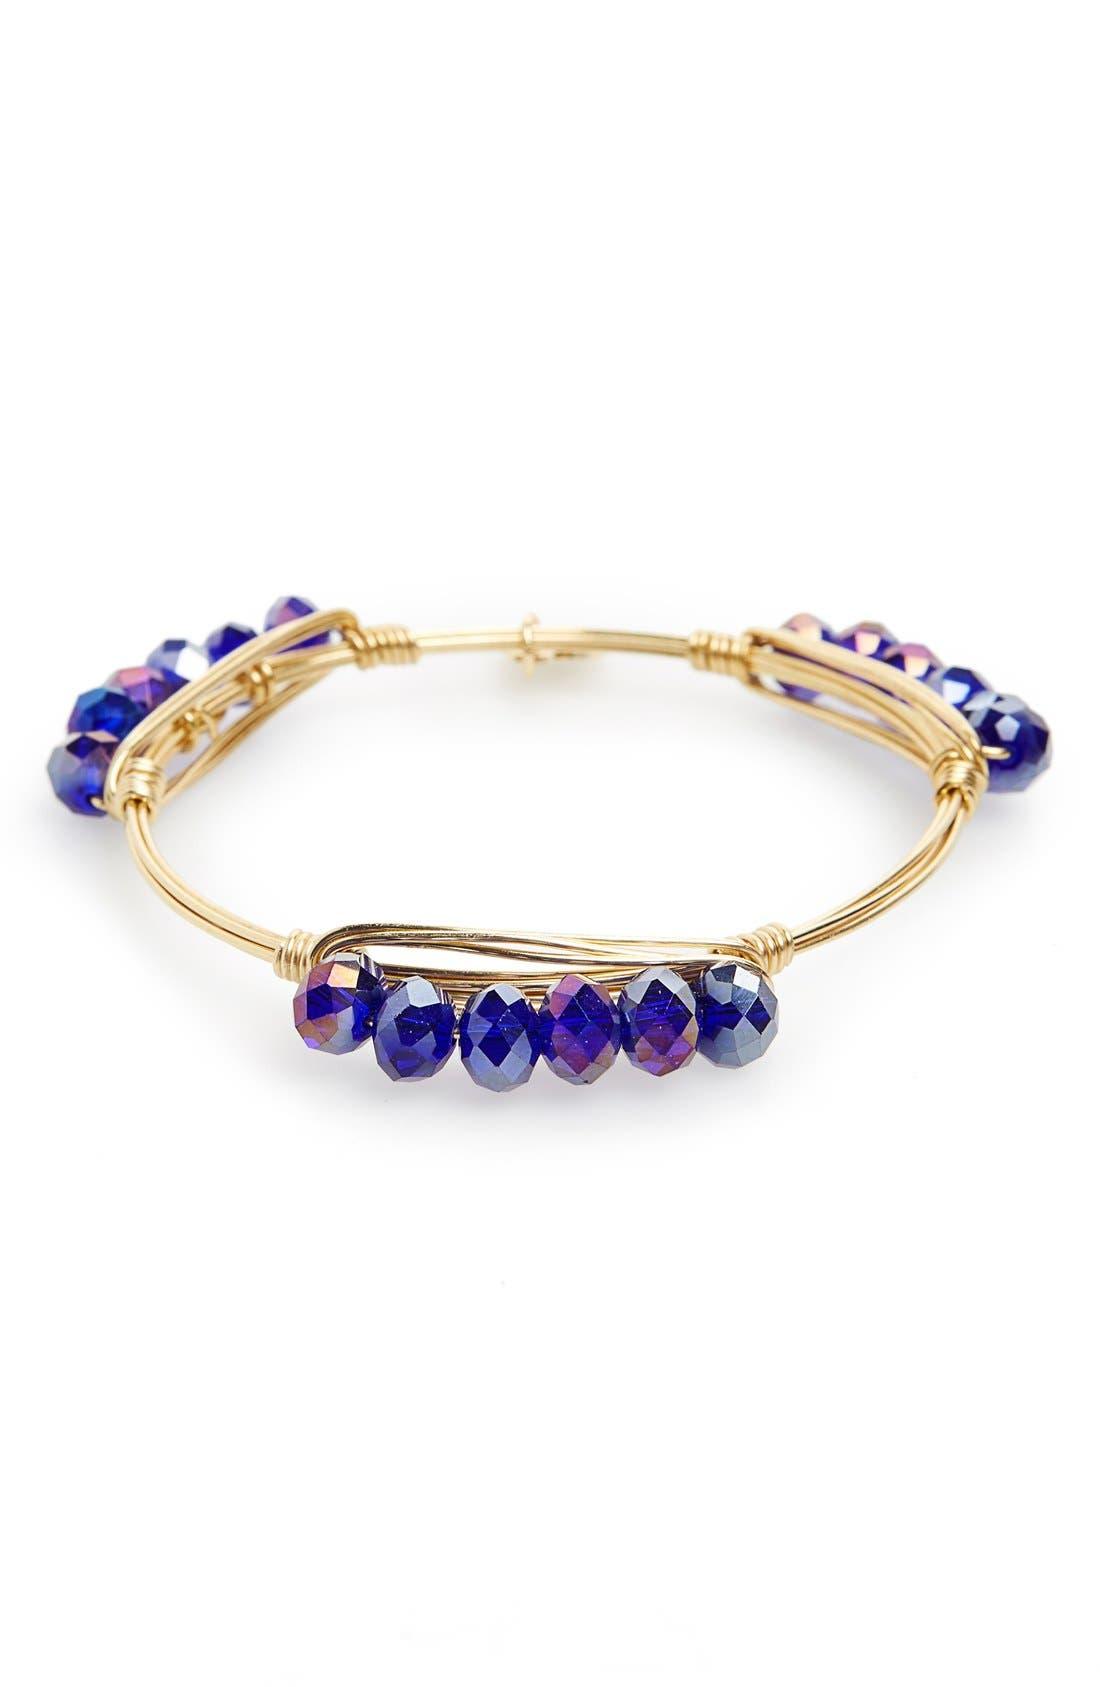 Main Image - Bourbon and Boweties 'Millie' Crystal Bracelet